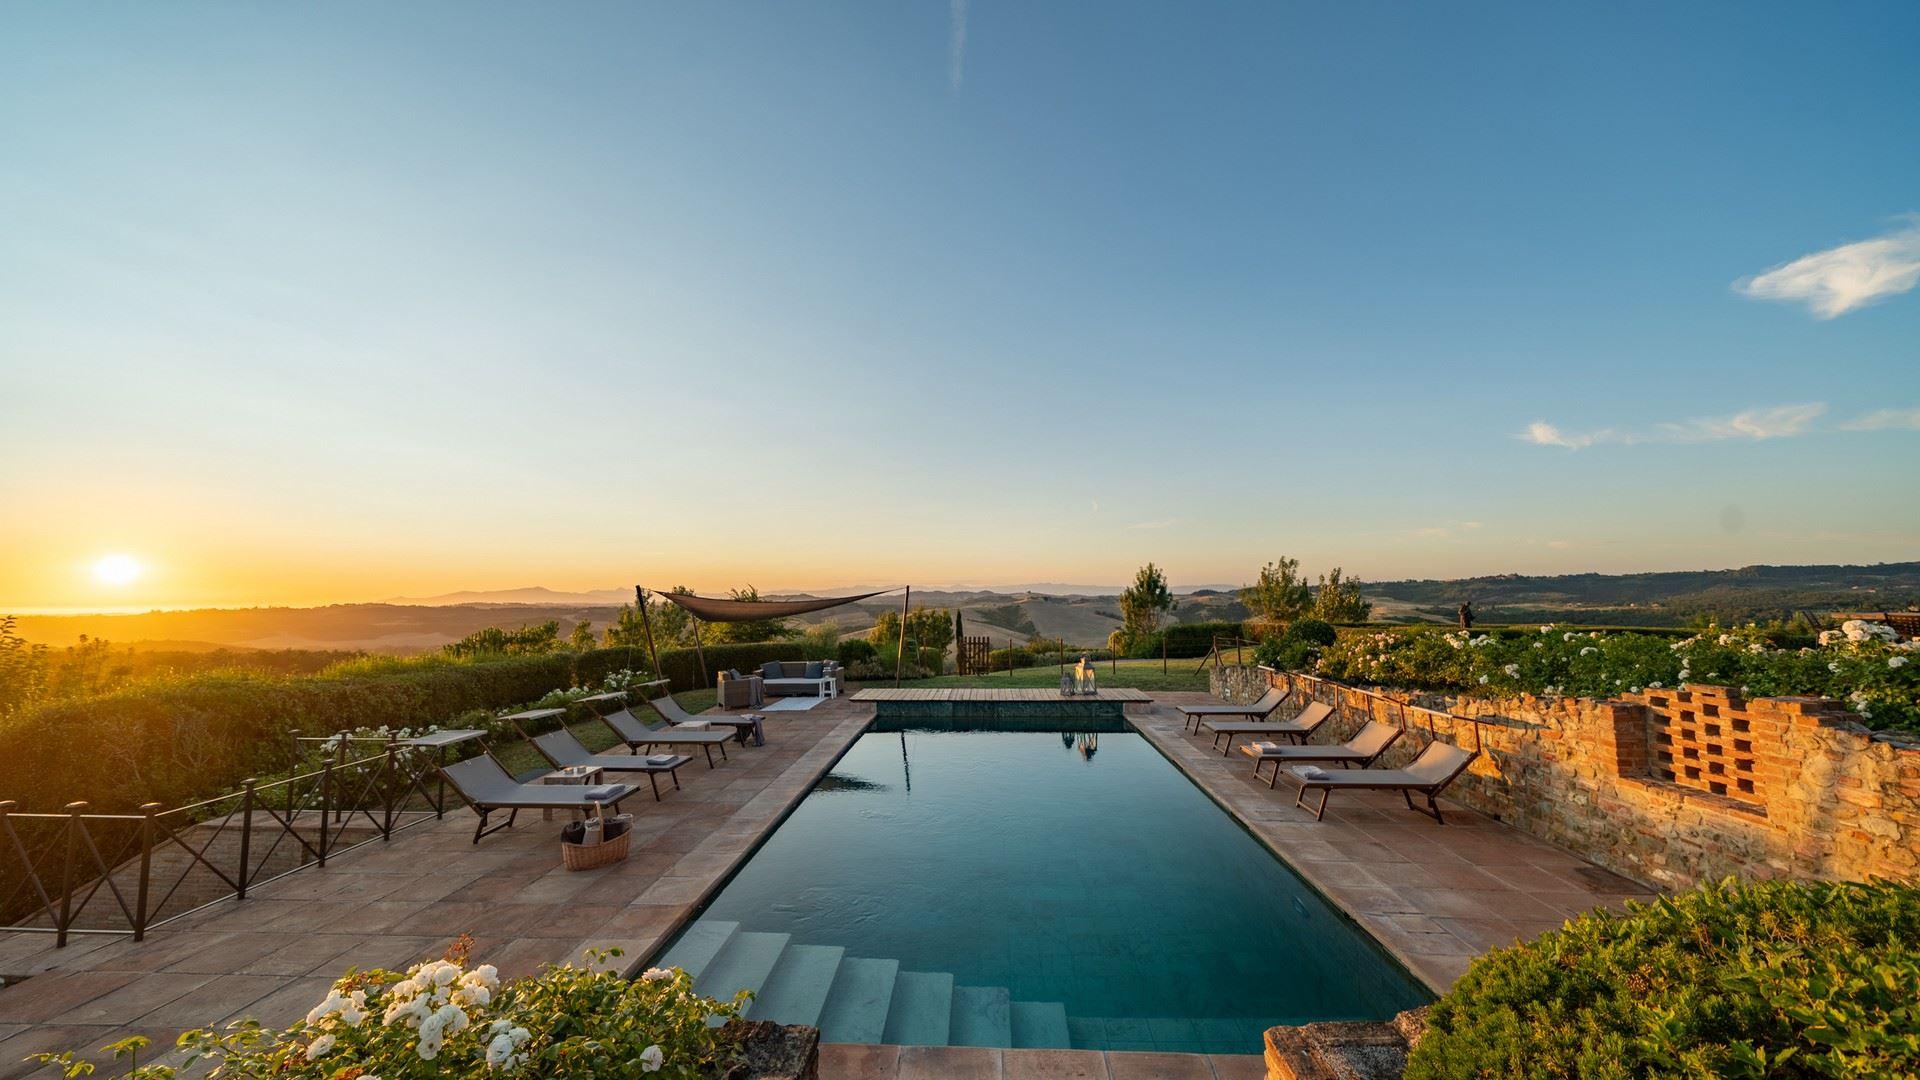 Toskana Finca mit privatem Pool bei Toskana Exklusiv